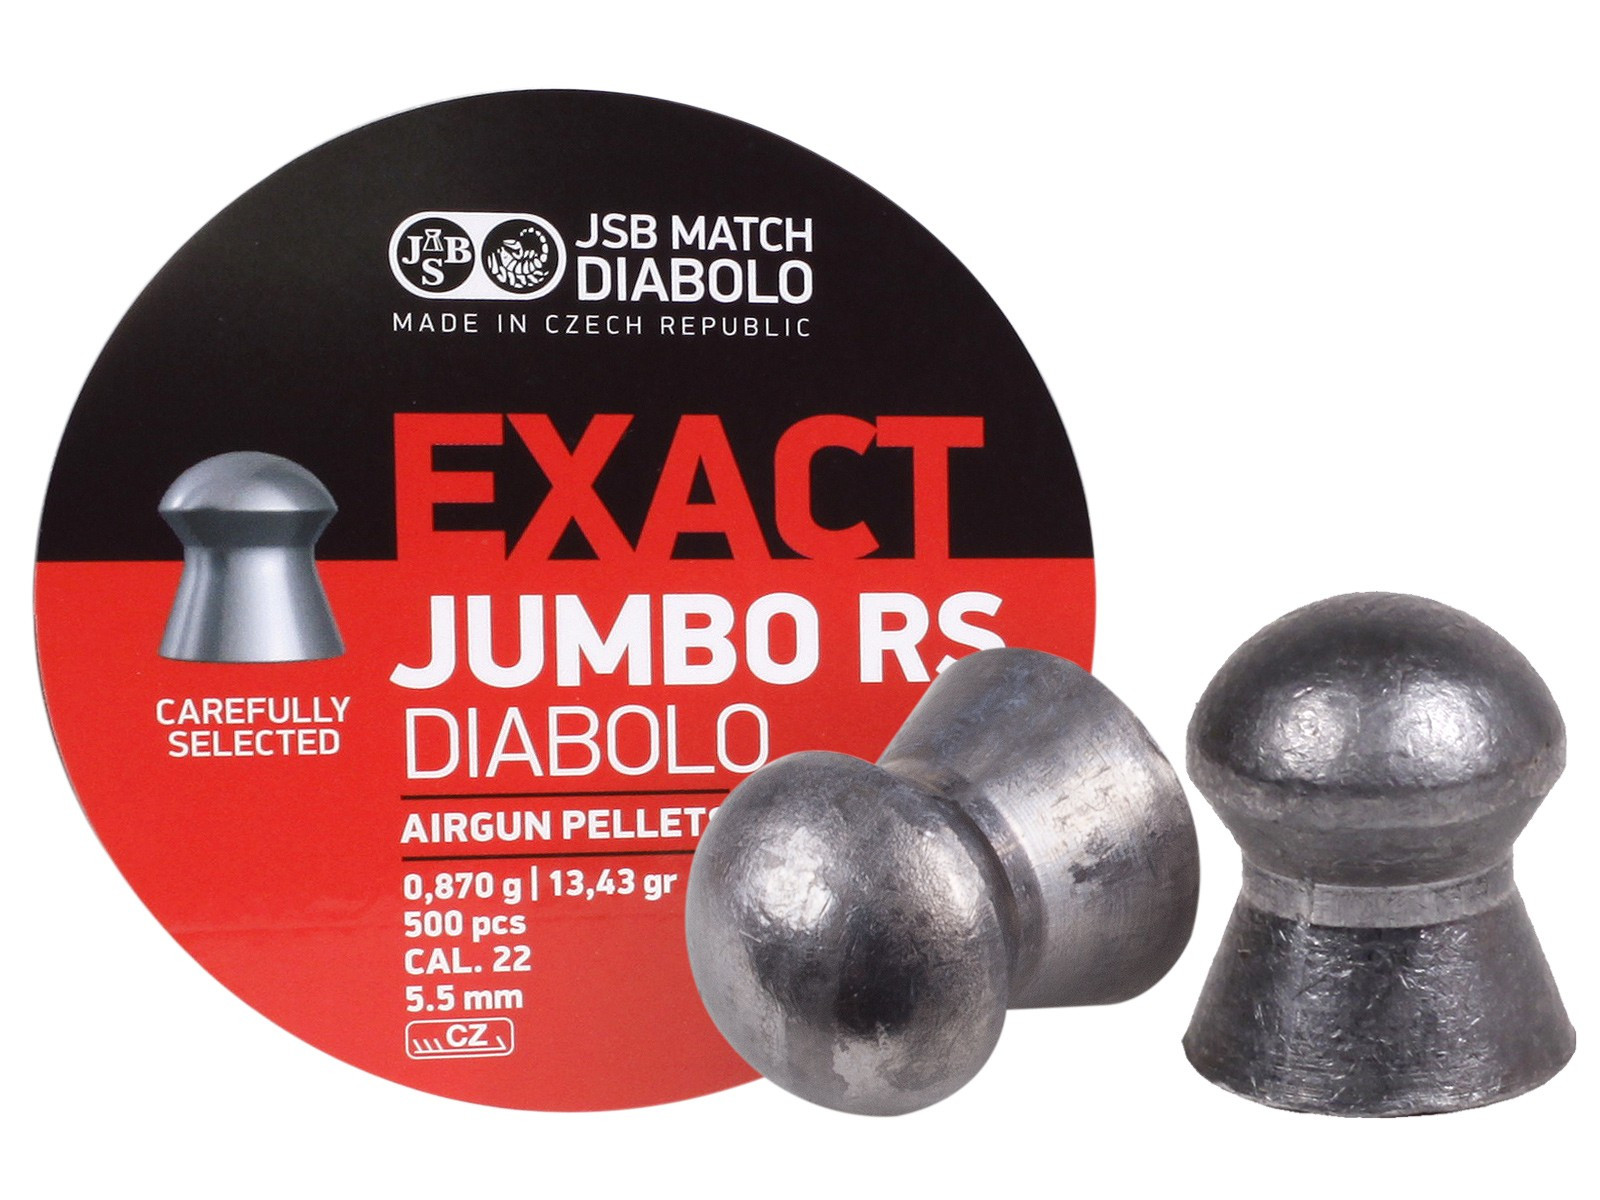 JSB Diabolo Exact Jumbo RS .22 Cal, 13.43 gr - 500 ct